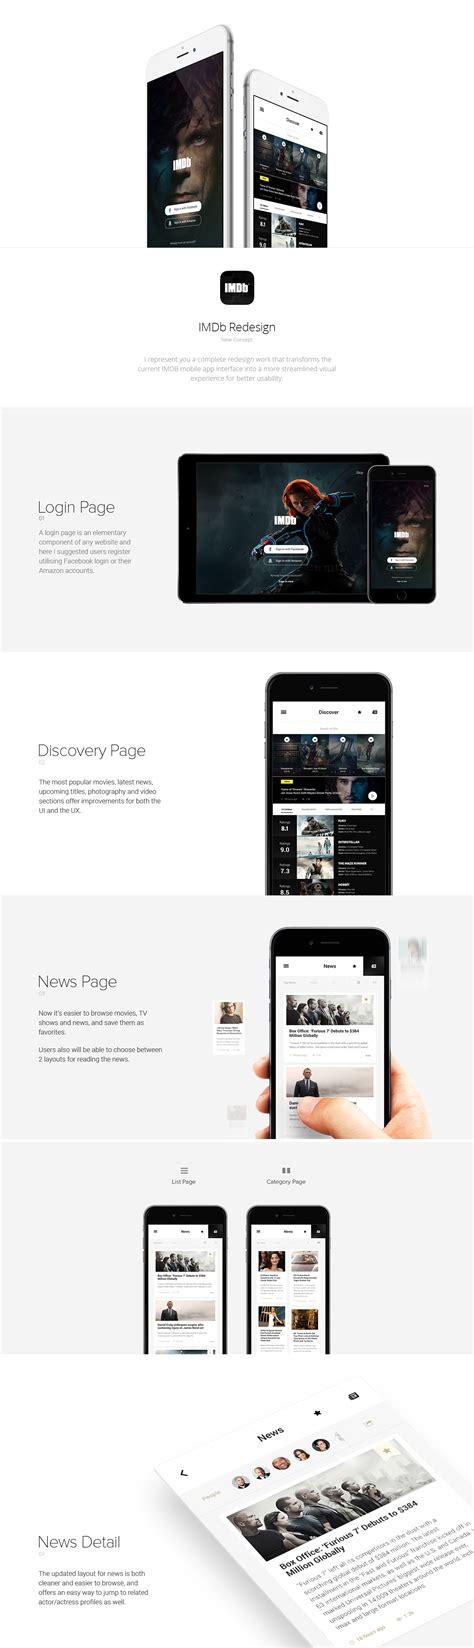 imdb mobile imdb mobile app redesign on behance mobile app mobile